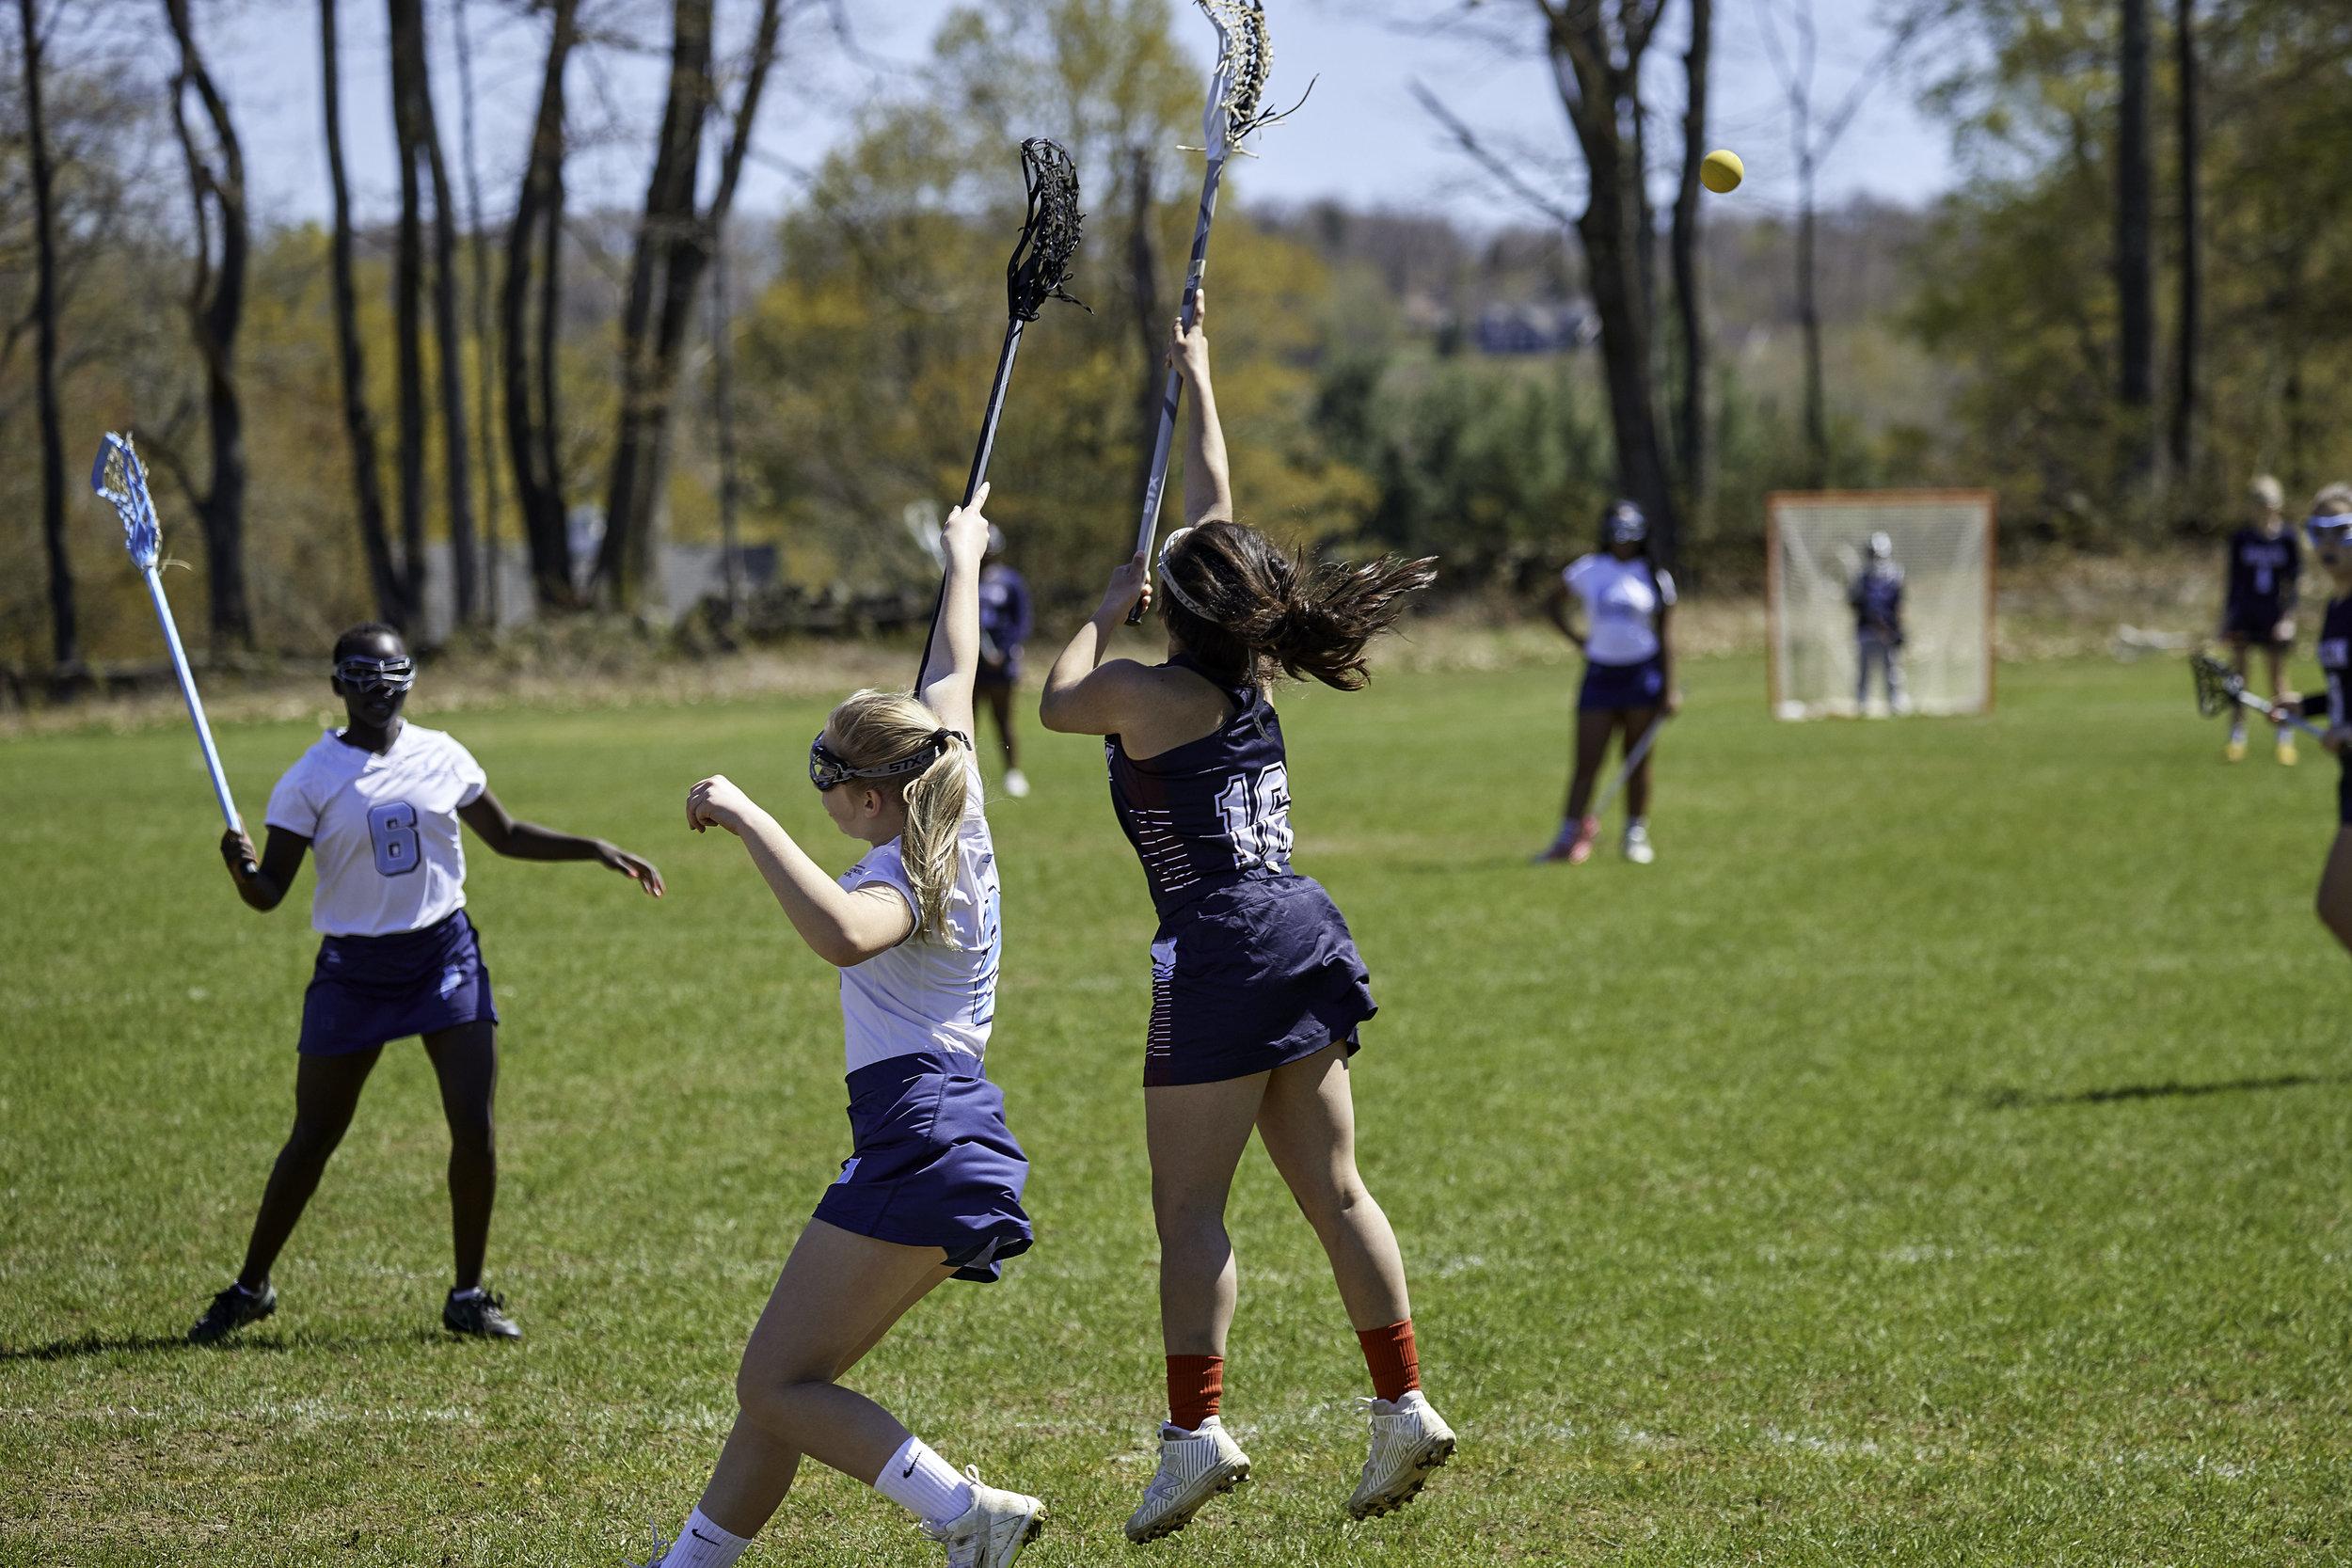 Girls Lacrosse vs. Stoneleigh Burnham School - May 11, 2019 - May 10, 2019193270.jpg